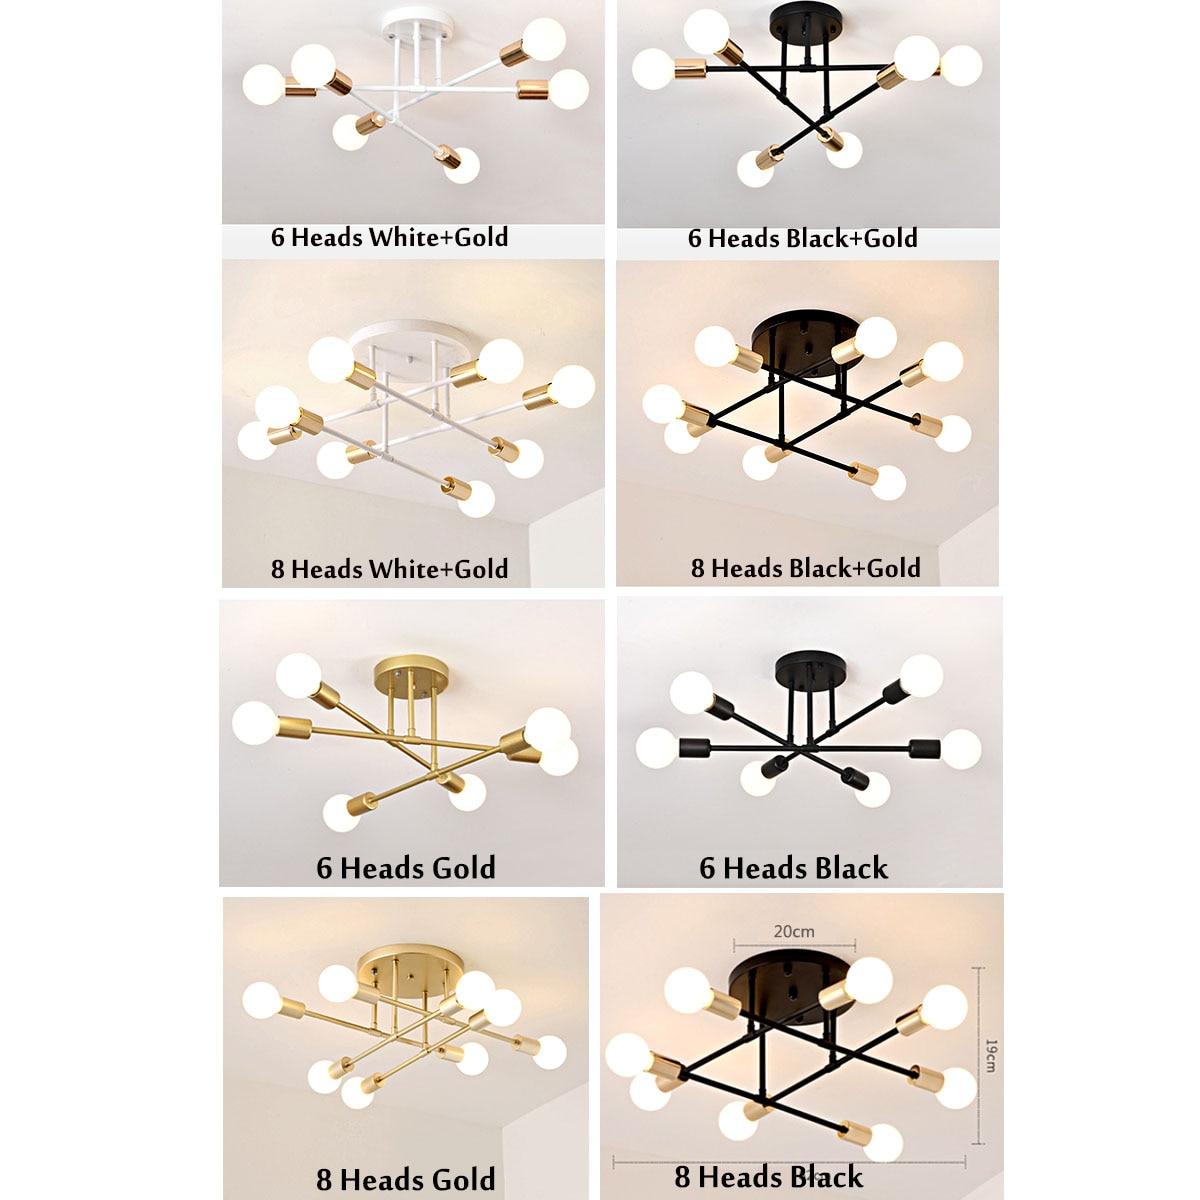 HTB1mXEUc8WD3KVjSZKPq6yp7FXaM 6/8 Head LED Industrial Iron Ceiling Lamp Black/Golden European Minimalist Living Room Lighting 220V E27 Anti-Rust & Durable